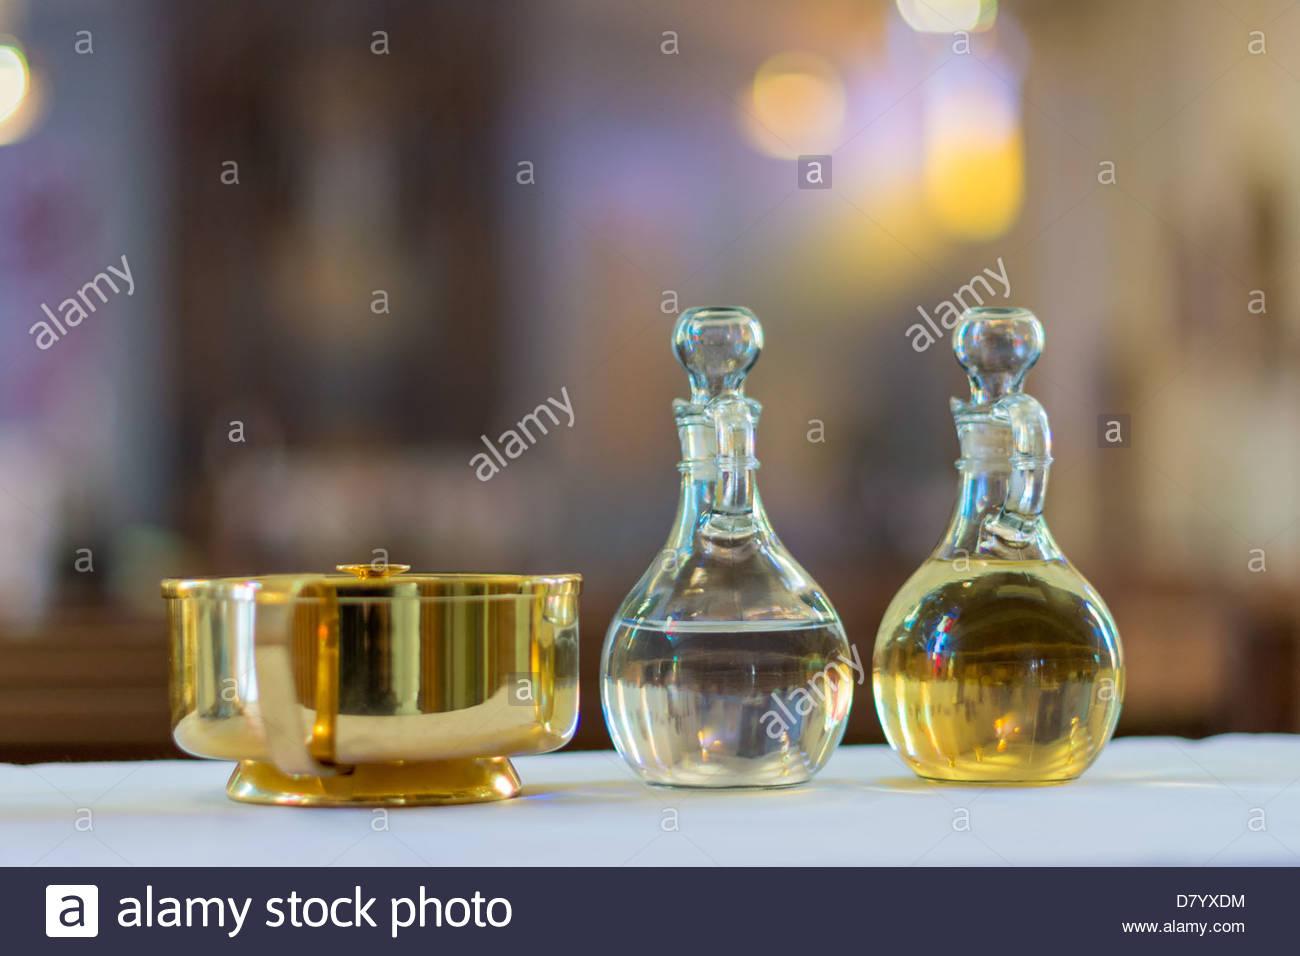 Symbols of the traditions of a catholic church holy water and oil symbols of the traditions of a catholic church holy water and oil for unction buycottarizona